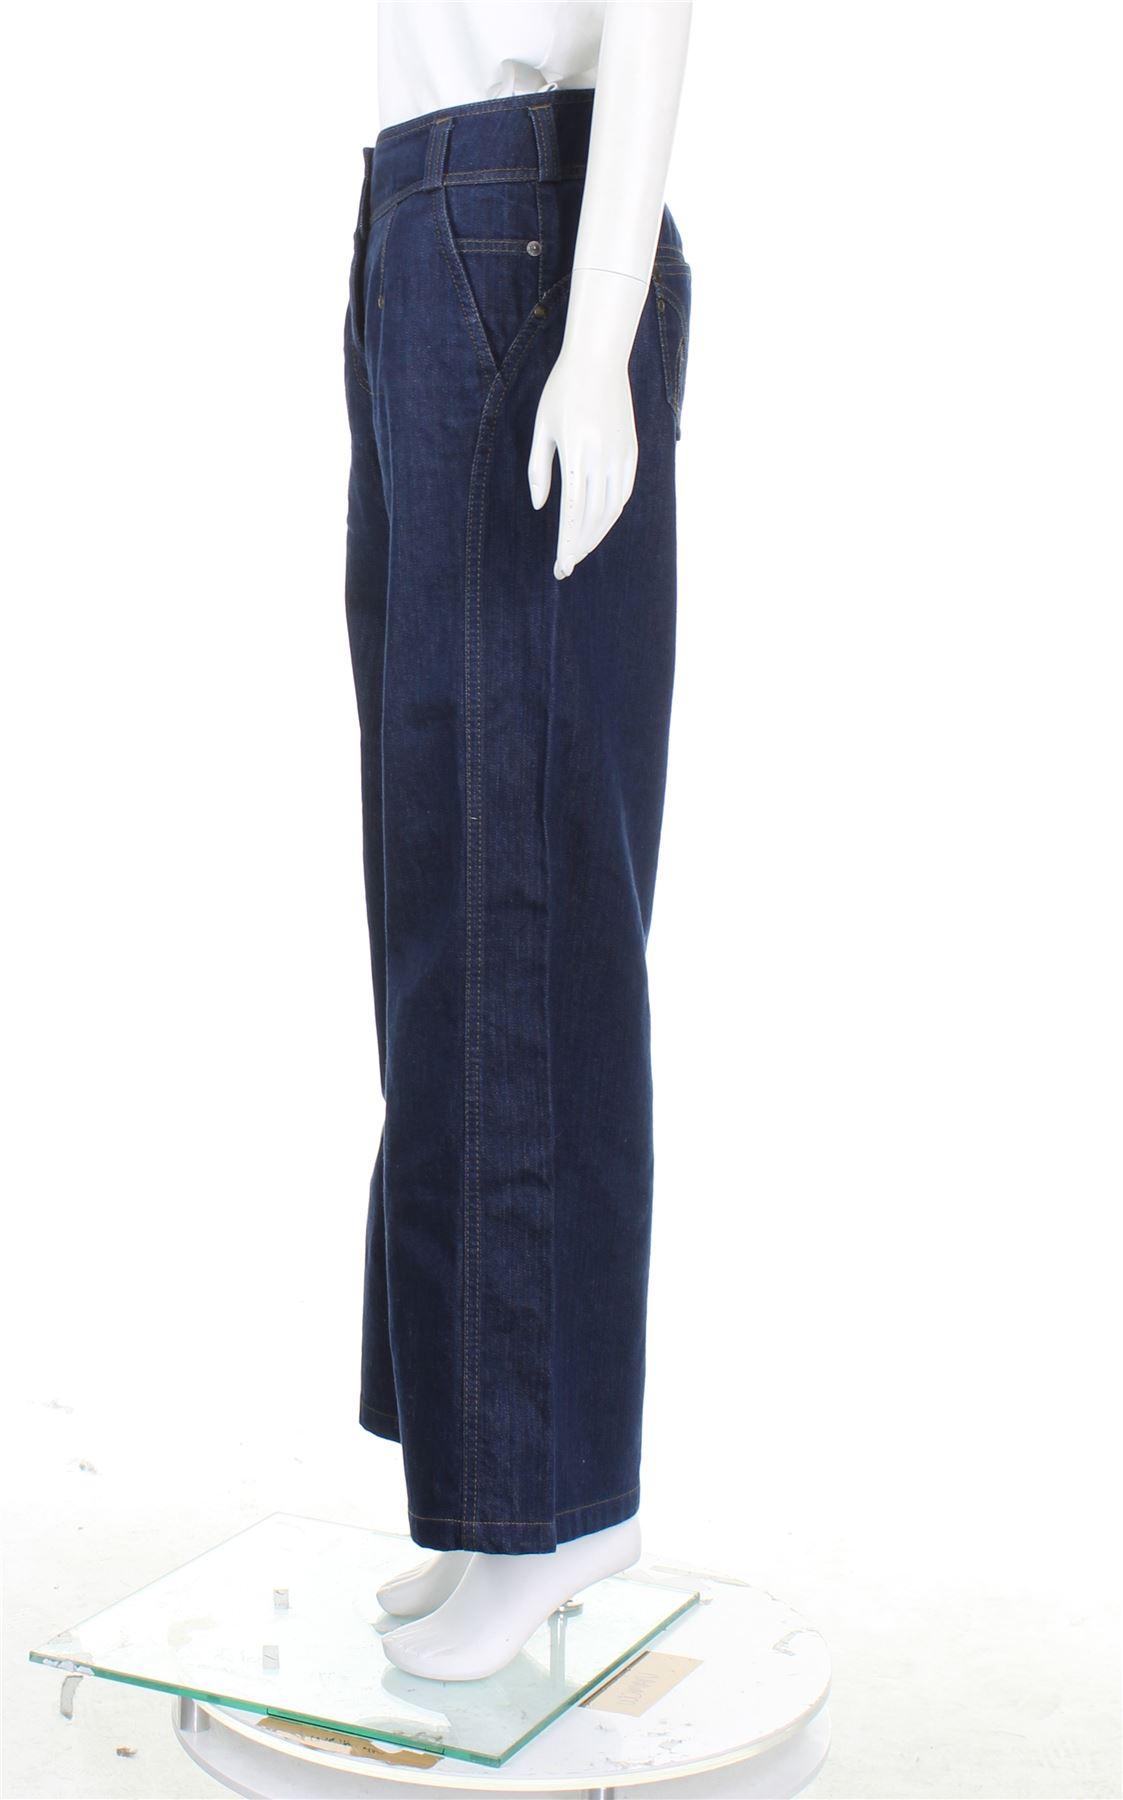 c1c75795 KENZO NAVY BLUE Denim Wide Leg Jeans, UK 10 US 6 EU 38 - EUR 50,25 ...